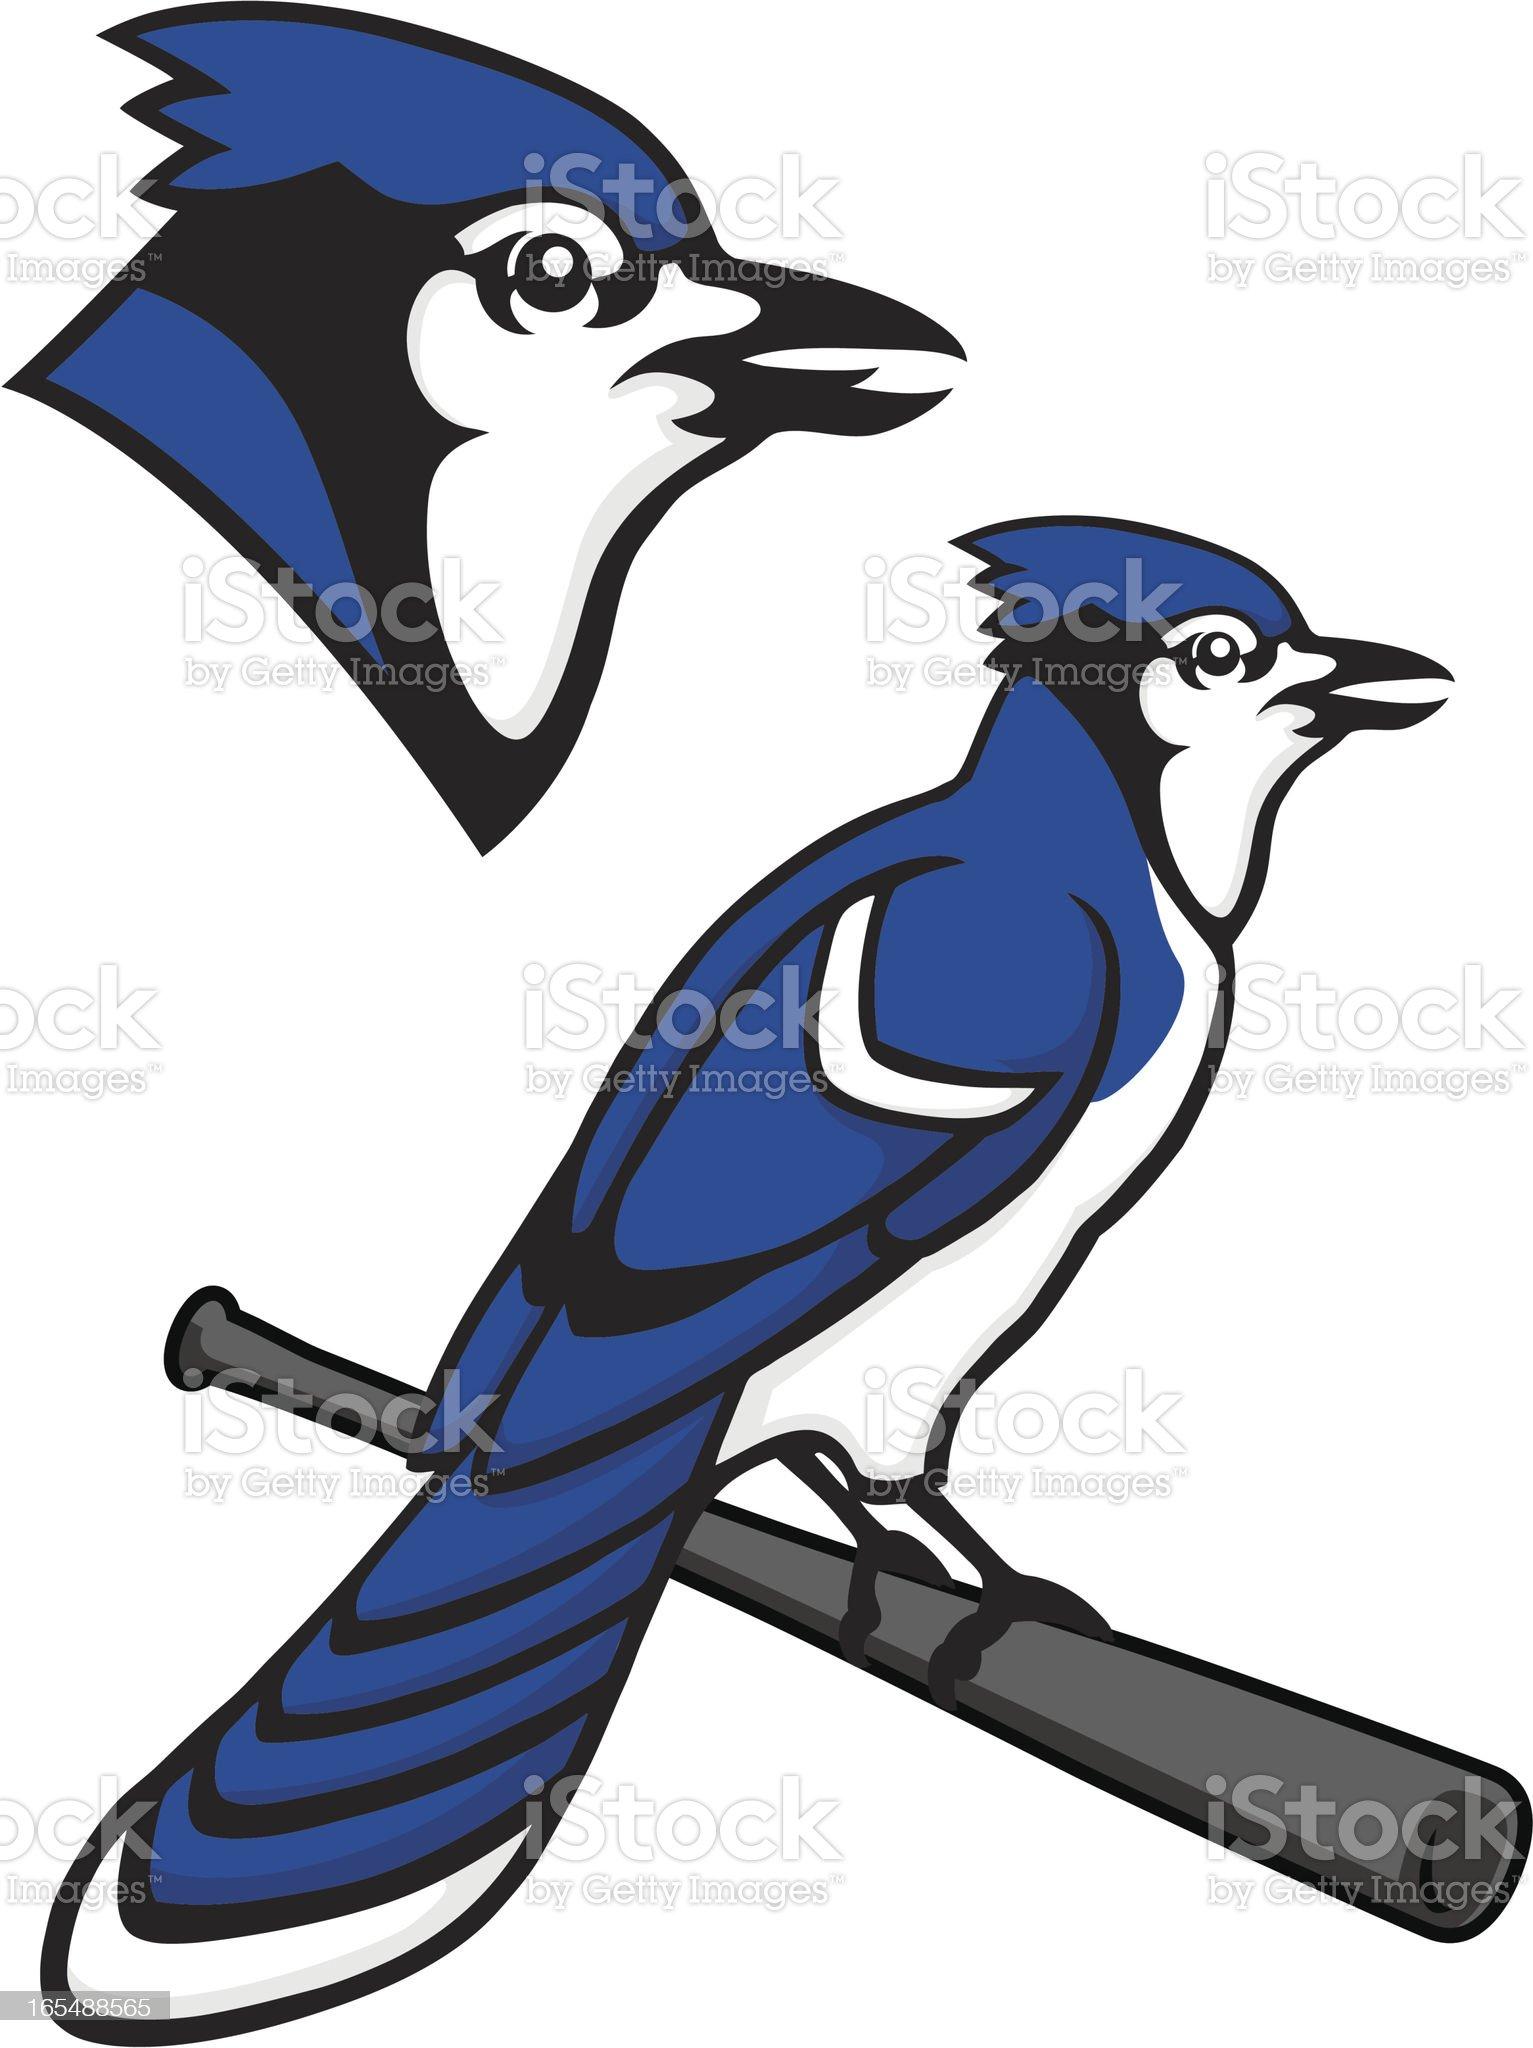 Blue Jay Mascot royalty-free stock vector art